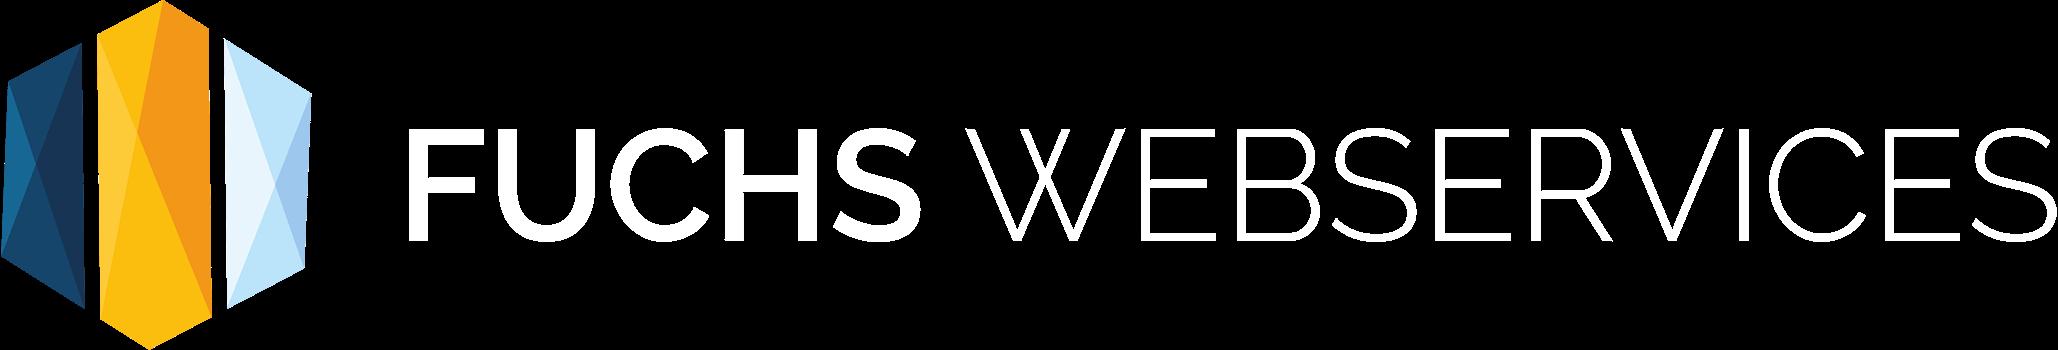 Fuchs Webservices